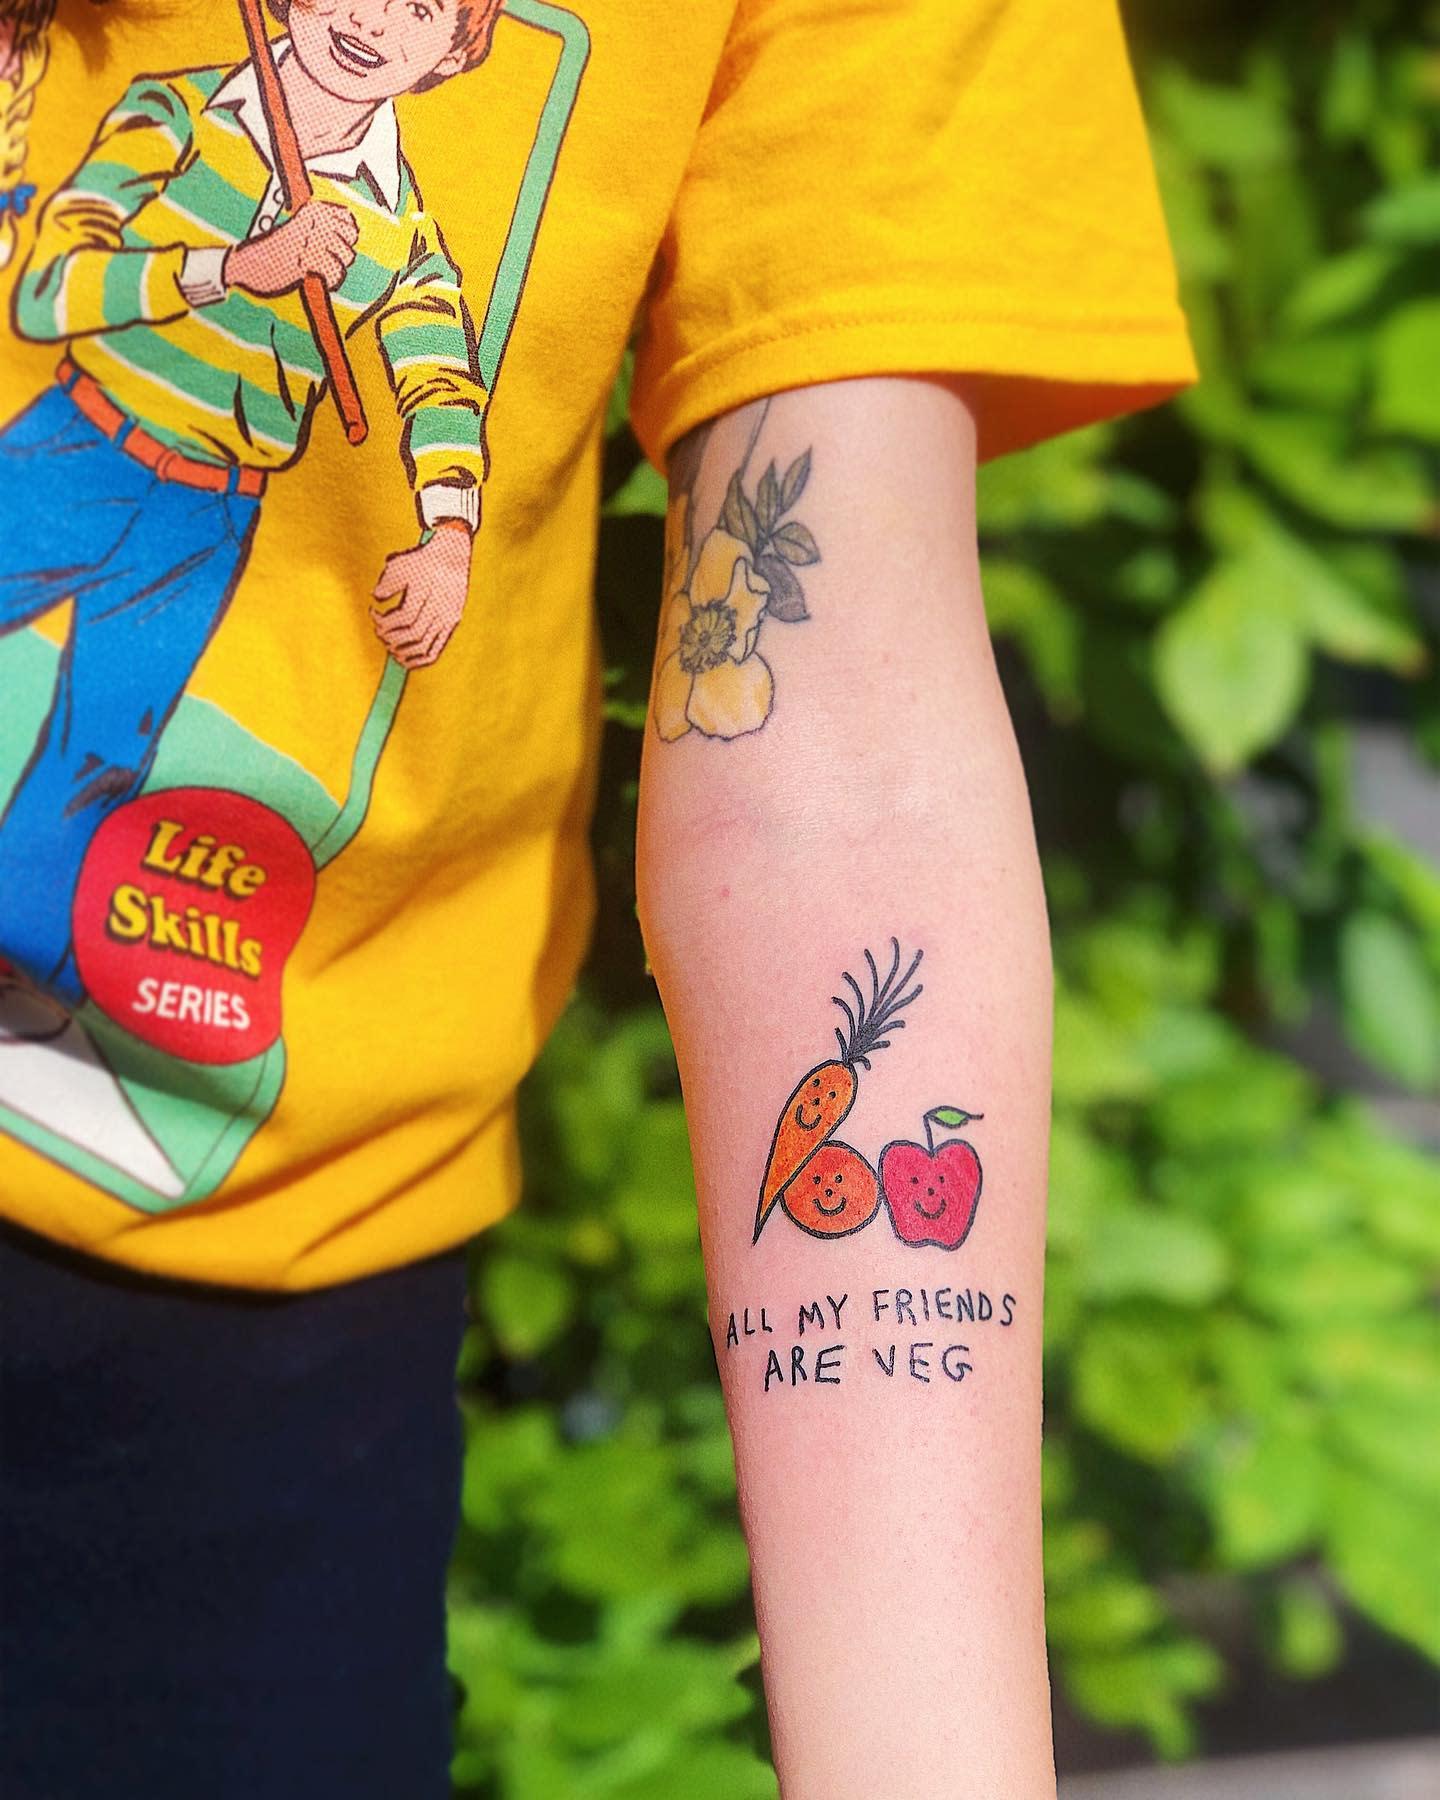 Süßes veganes Tattoo -_harrymckenzie